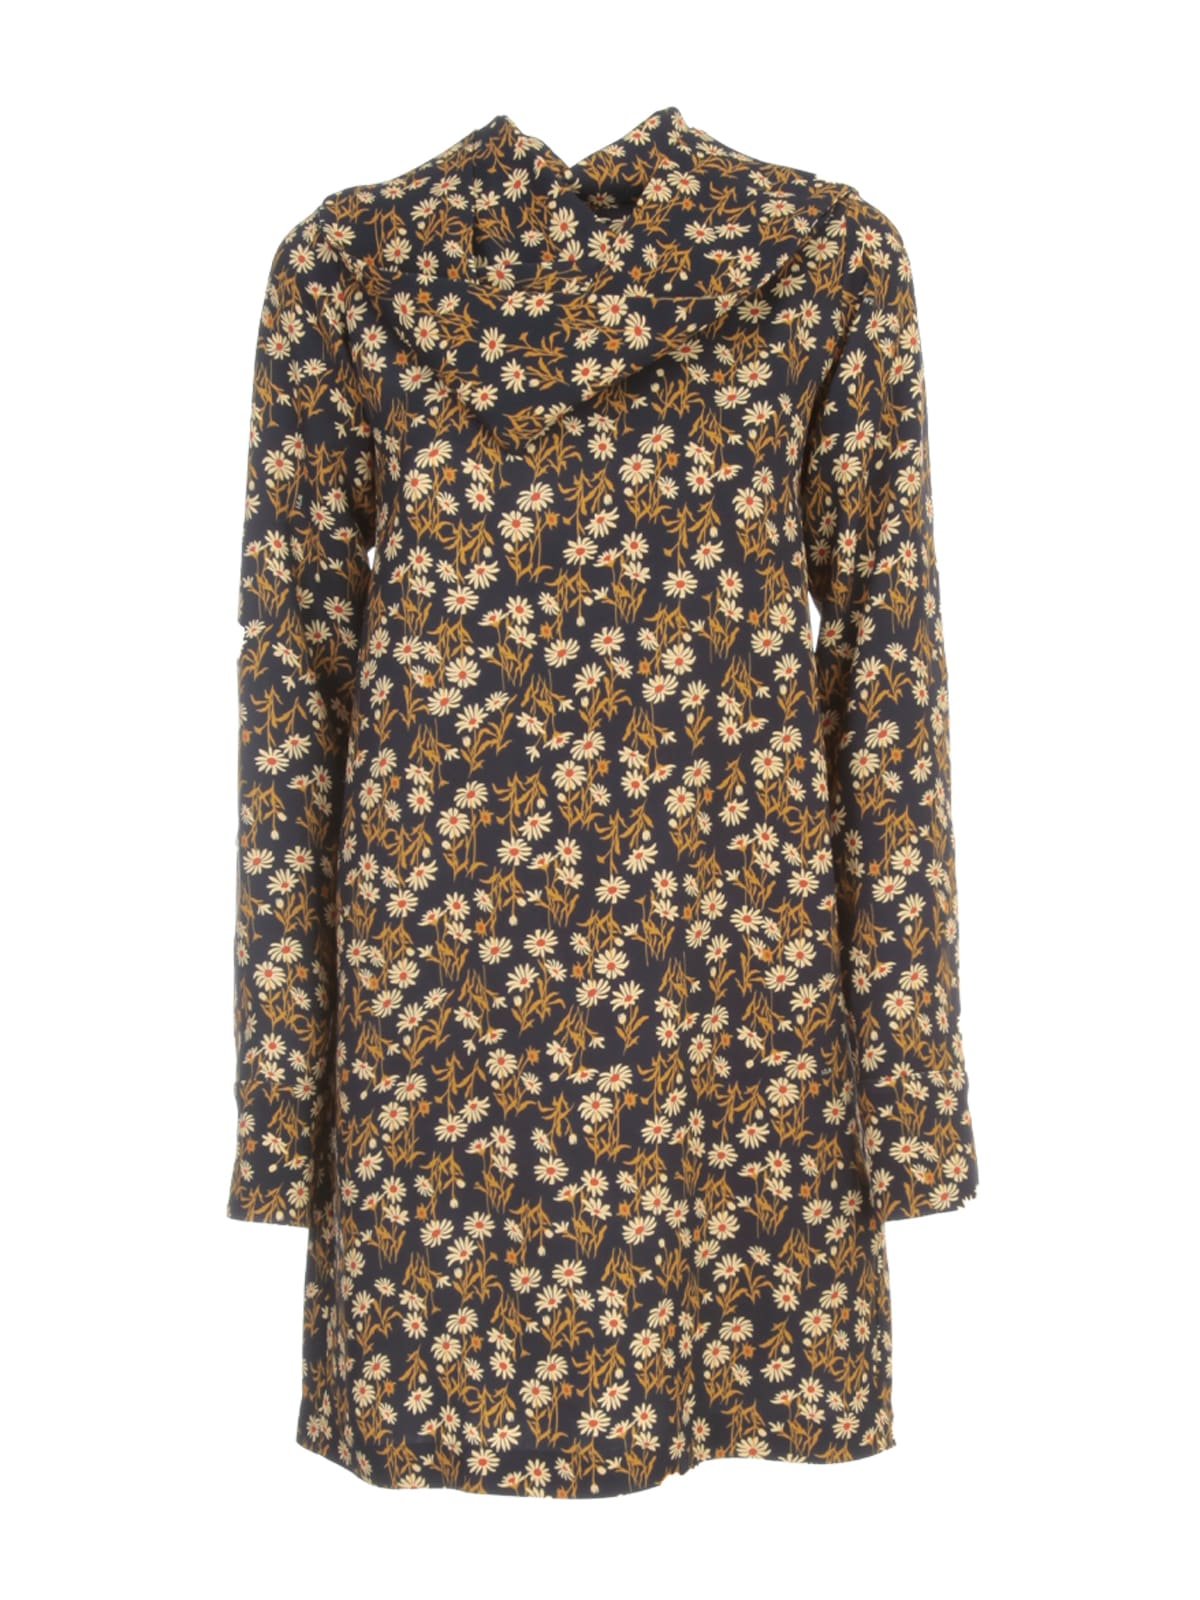 N°21 PRINTED SHORT DRESS